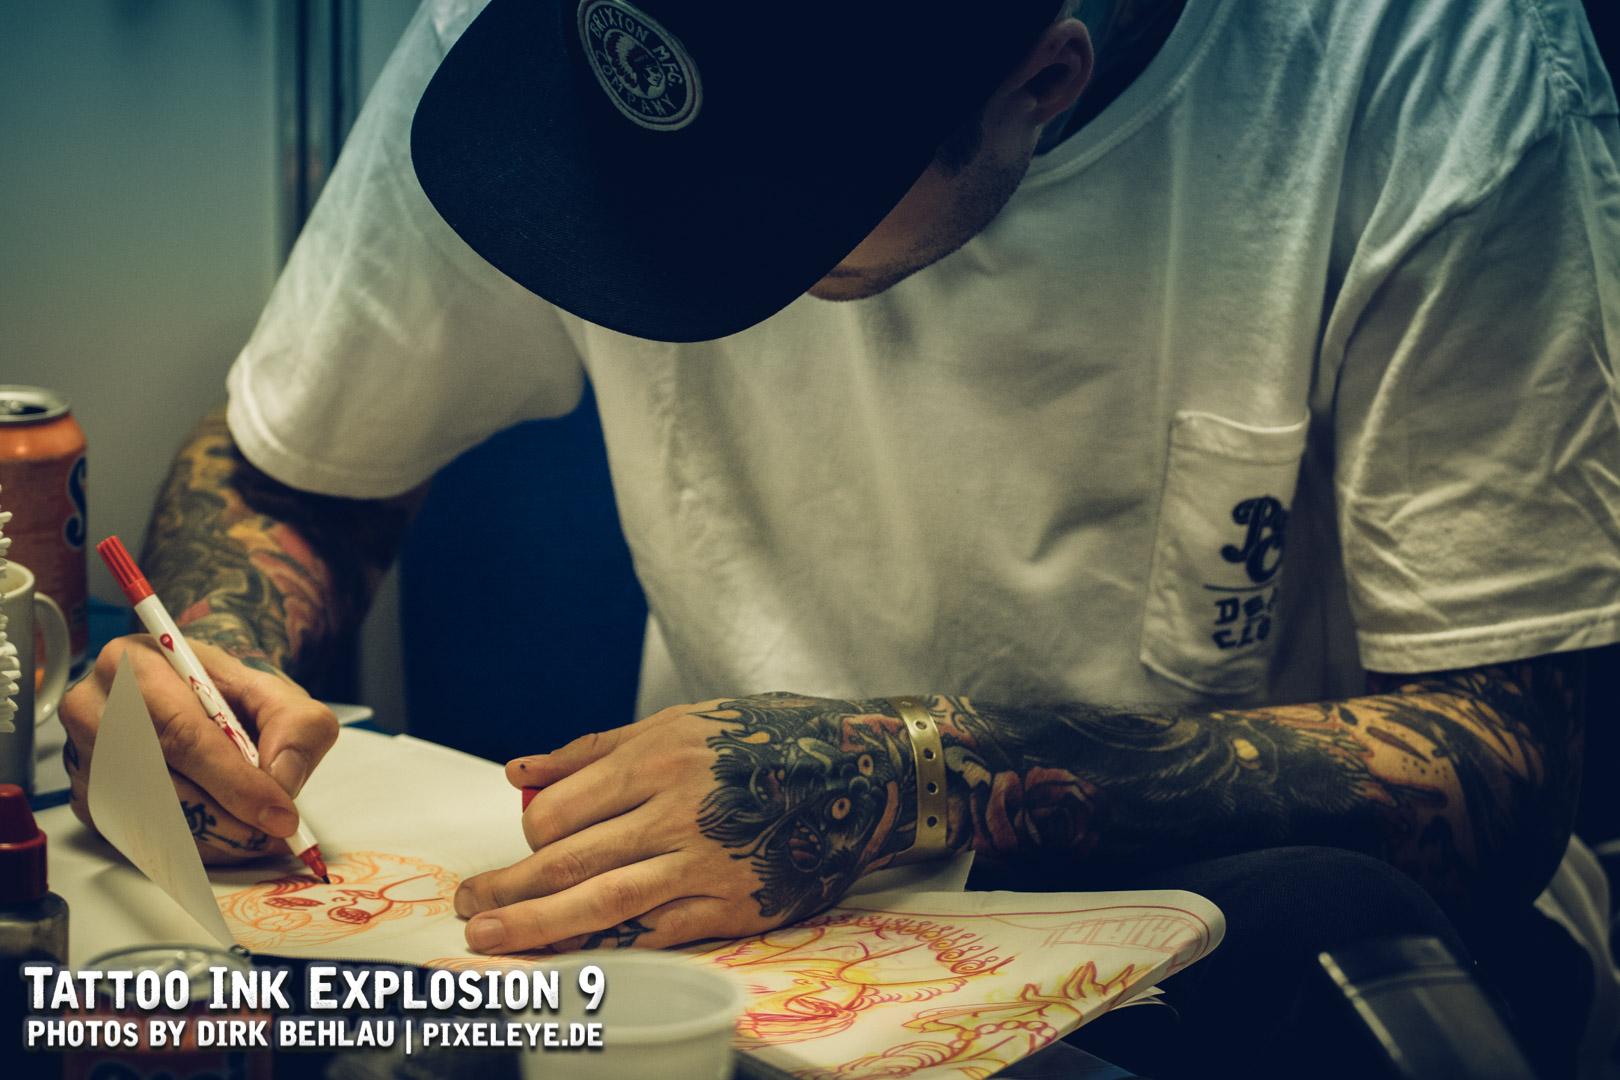 Tattoo Ink Explosion 2018 WEB by Dirk Behlau-1257.jpg